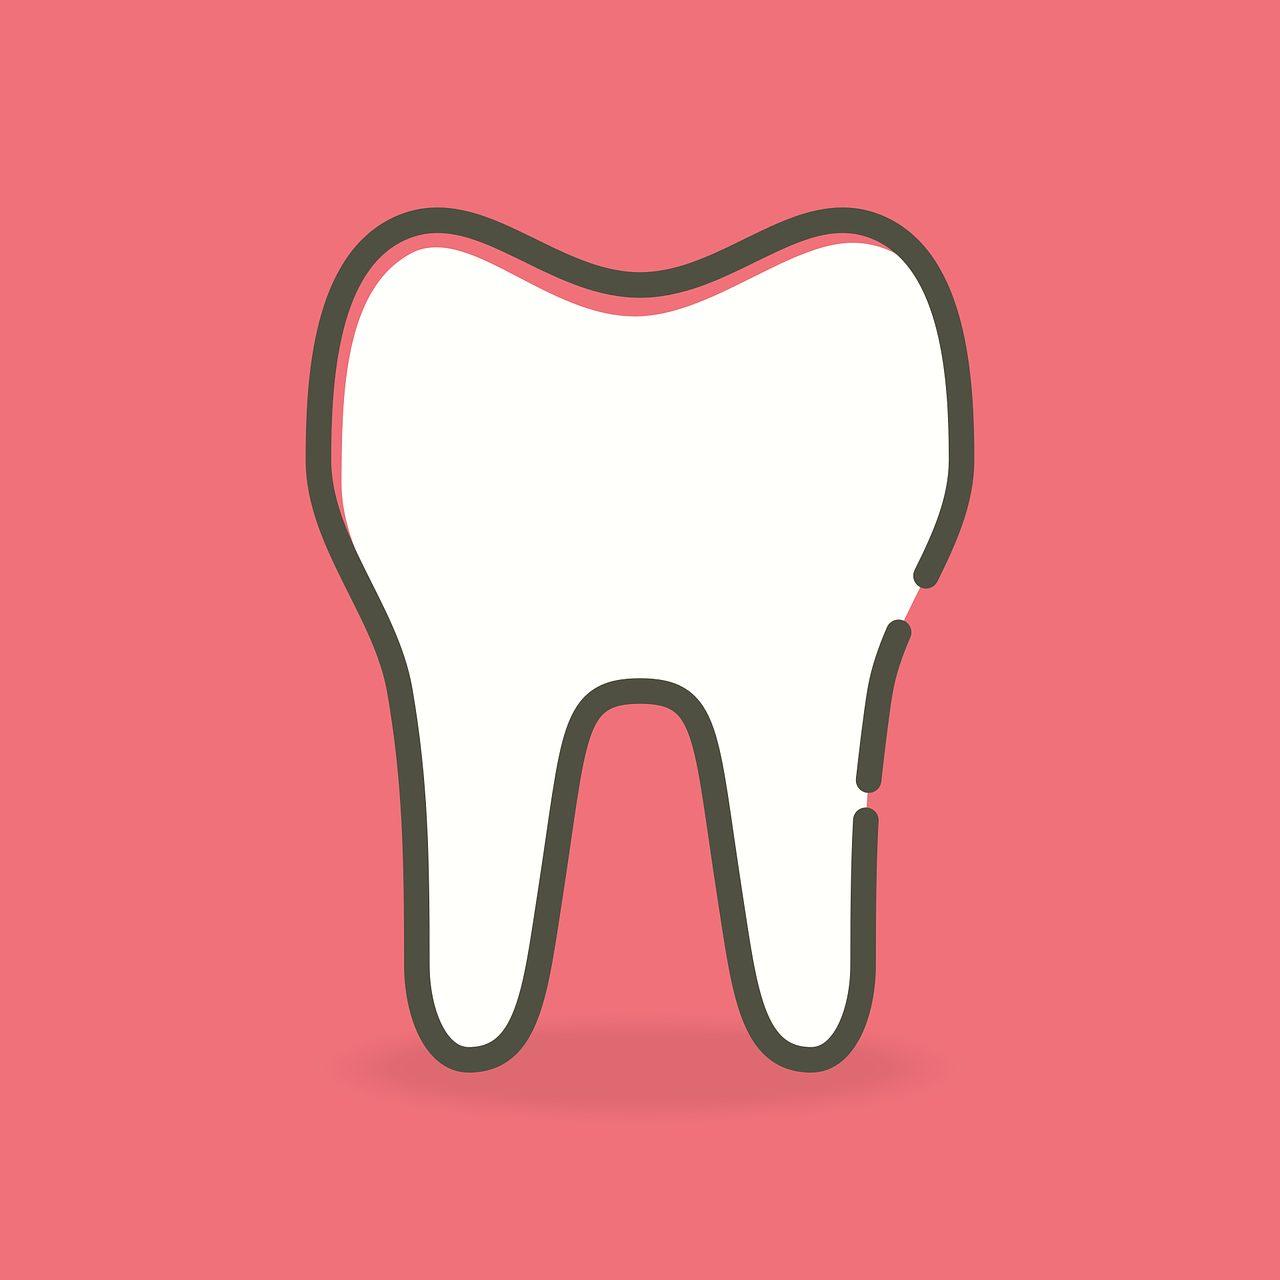 Kruk L vd angst tandarts